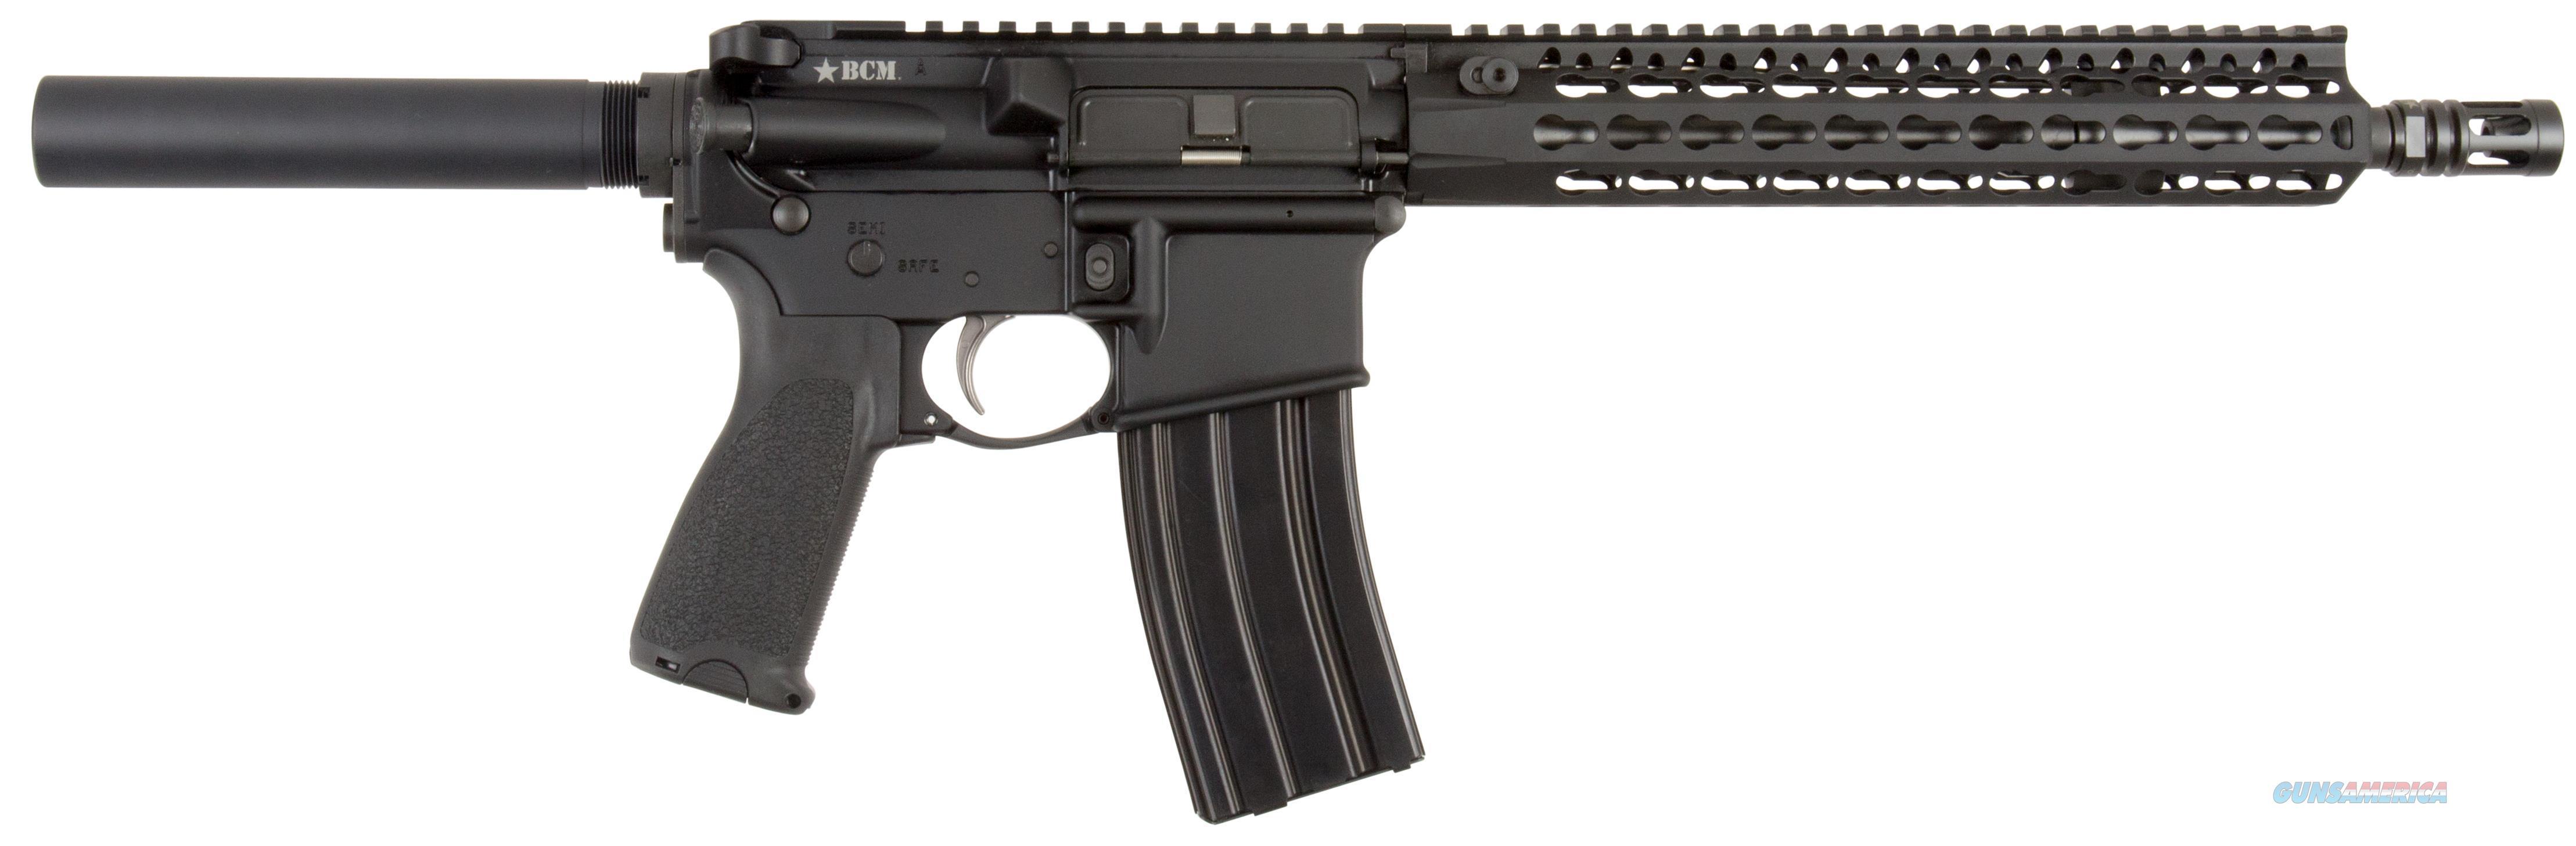 "Bravo 610890Elw Bcm Recce-11 Ar Pistol Semi-Automatic 223 Remington/5.56 Nato 11"" Black 610-890-ELW  Guns > Pistols > B Misc Pistols"